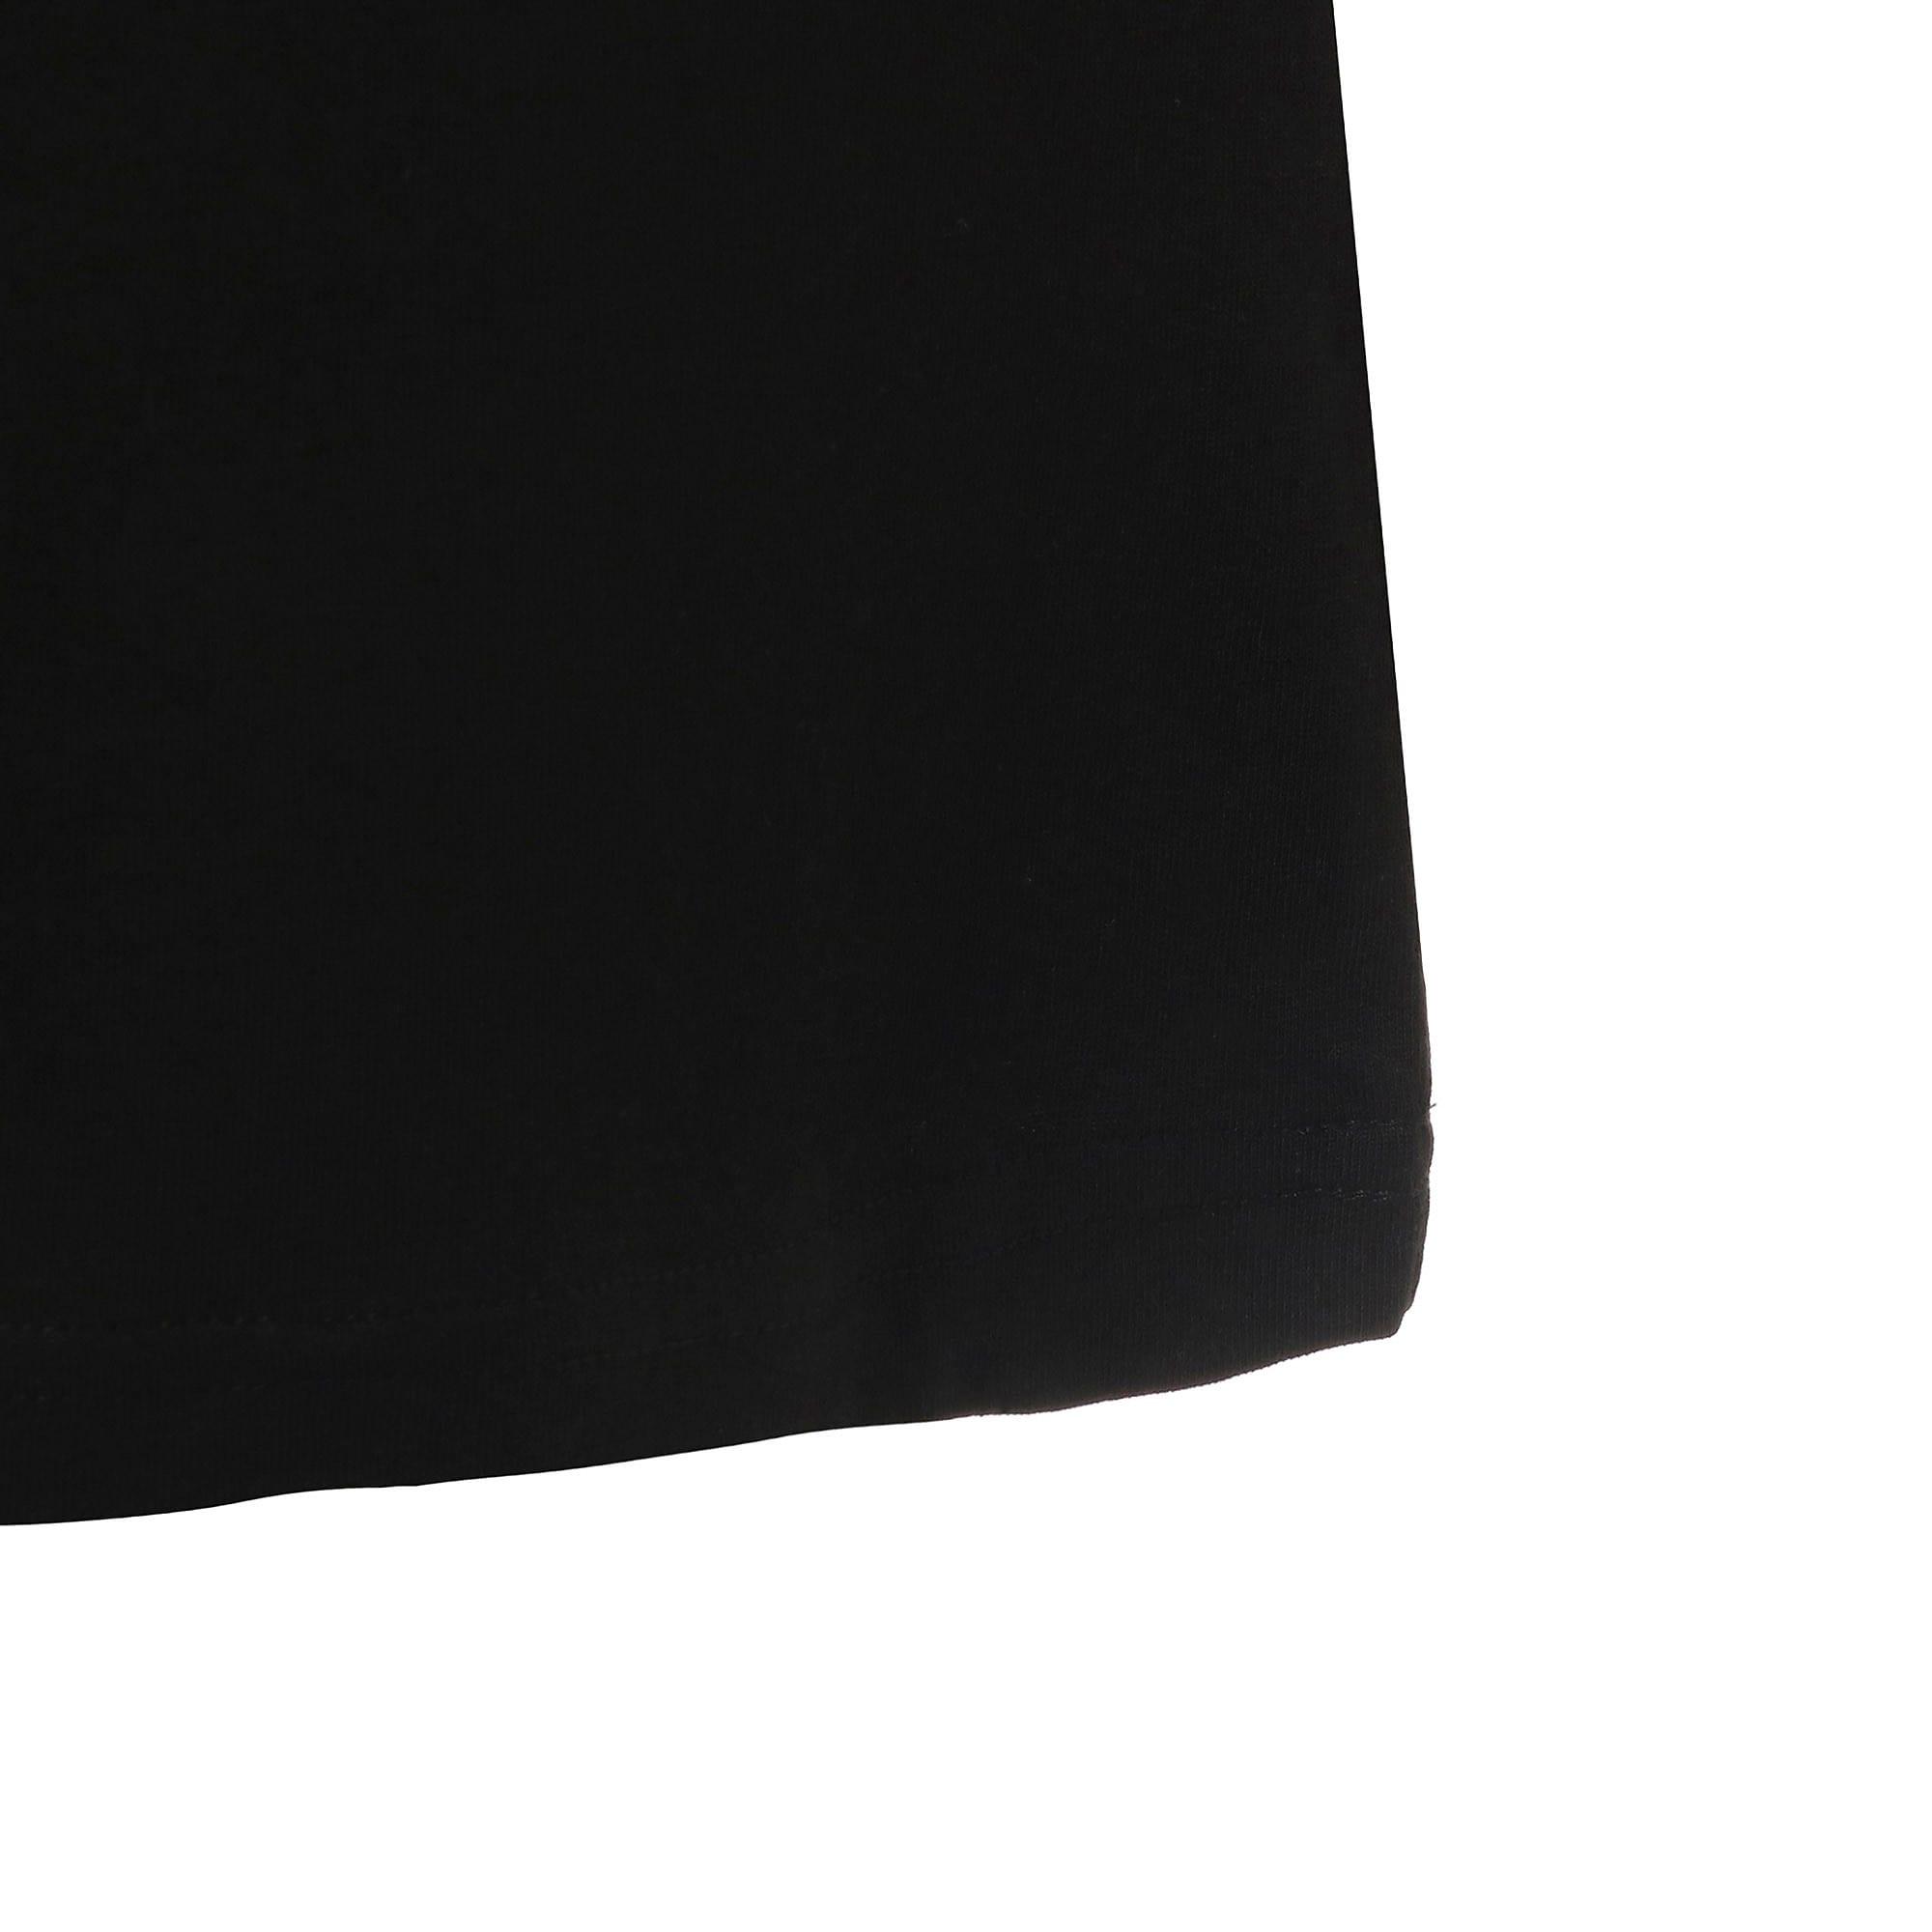 Thumbnail 8 of PUMA XTG グラフィック ウィメンズ SS Tシャツ 半袖, Cotton Black, medium-JPN